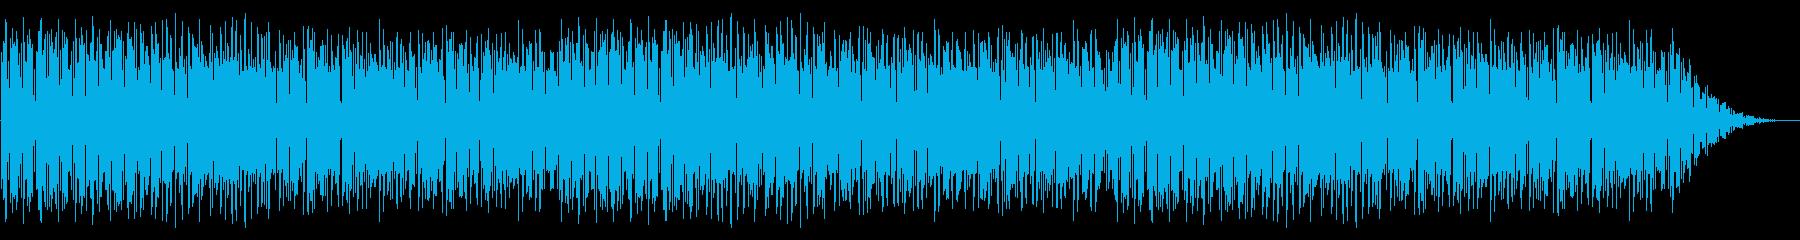 GB風レースゲームのステージ曲の再生済みの波形